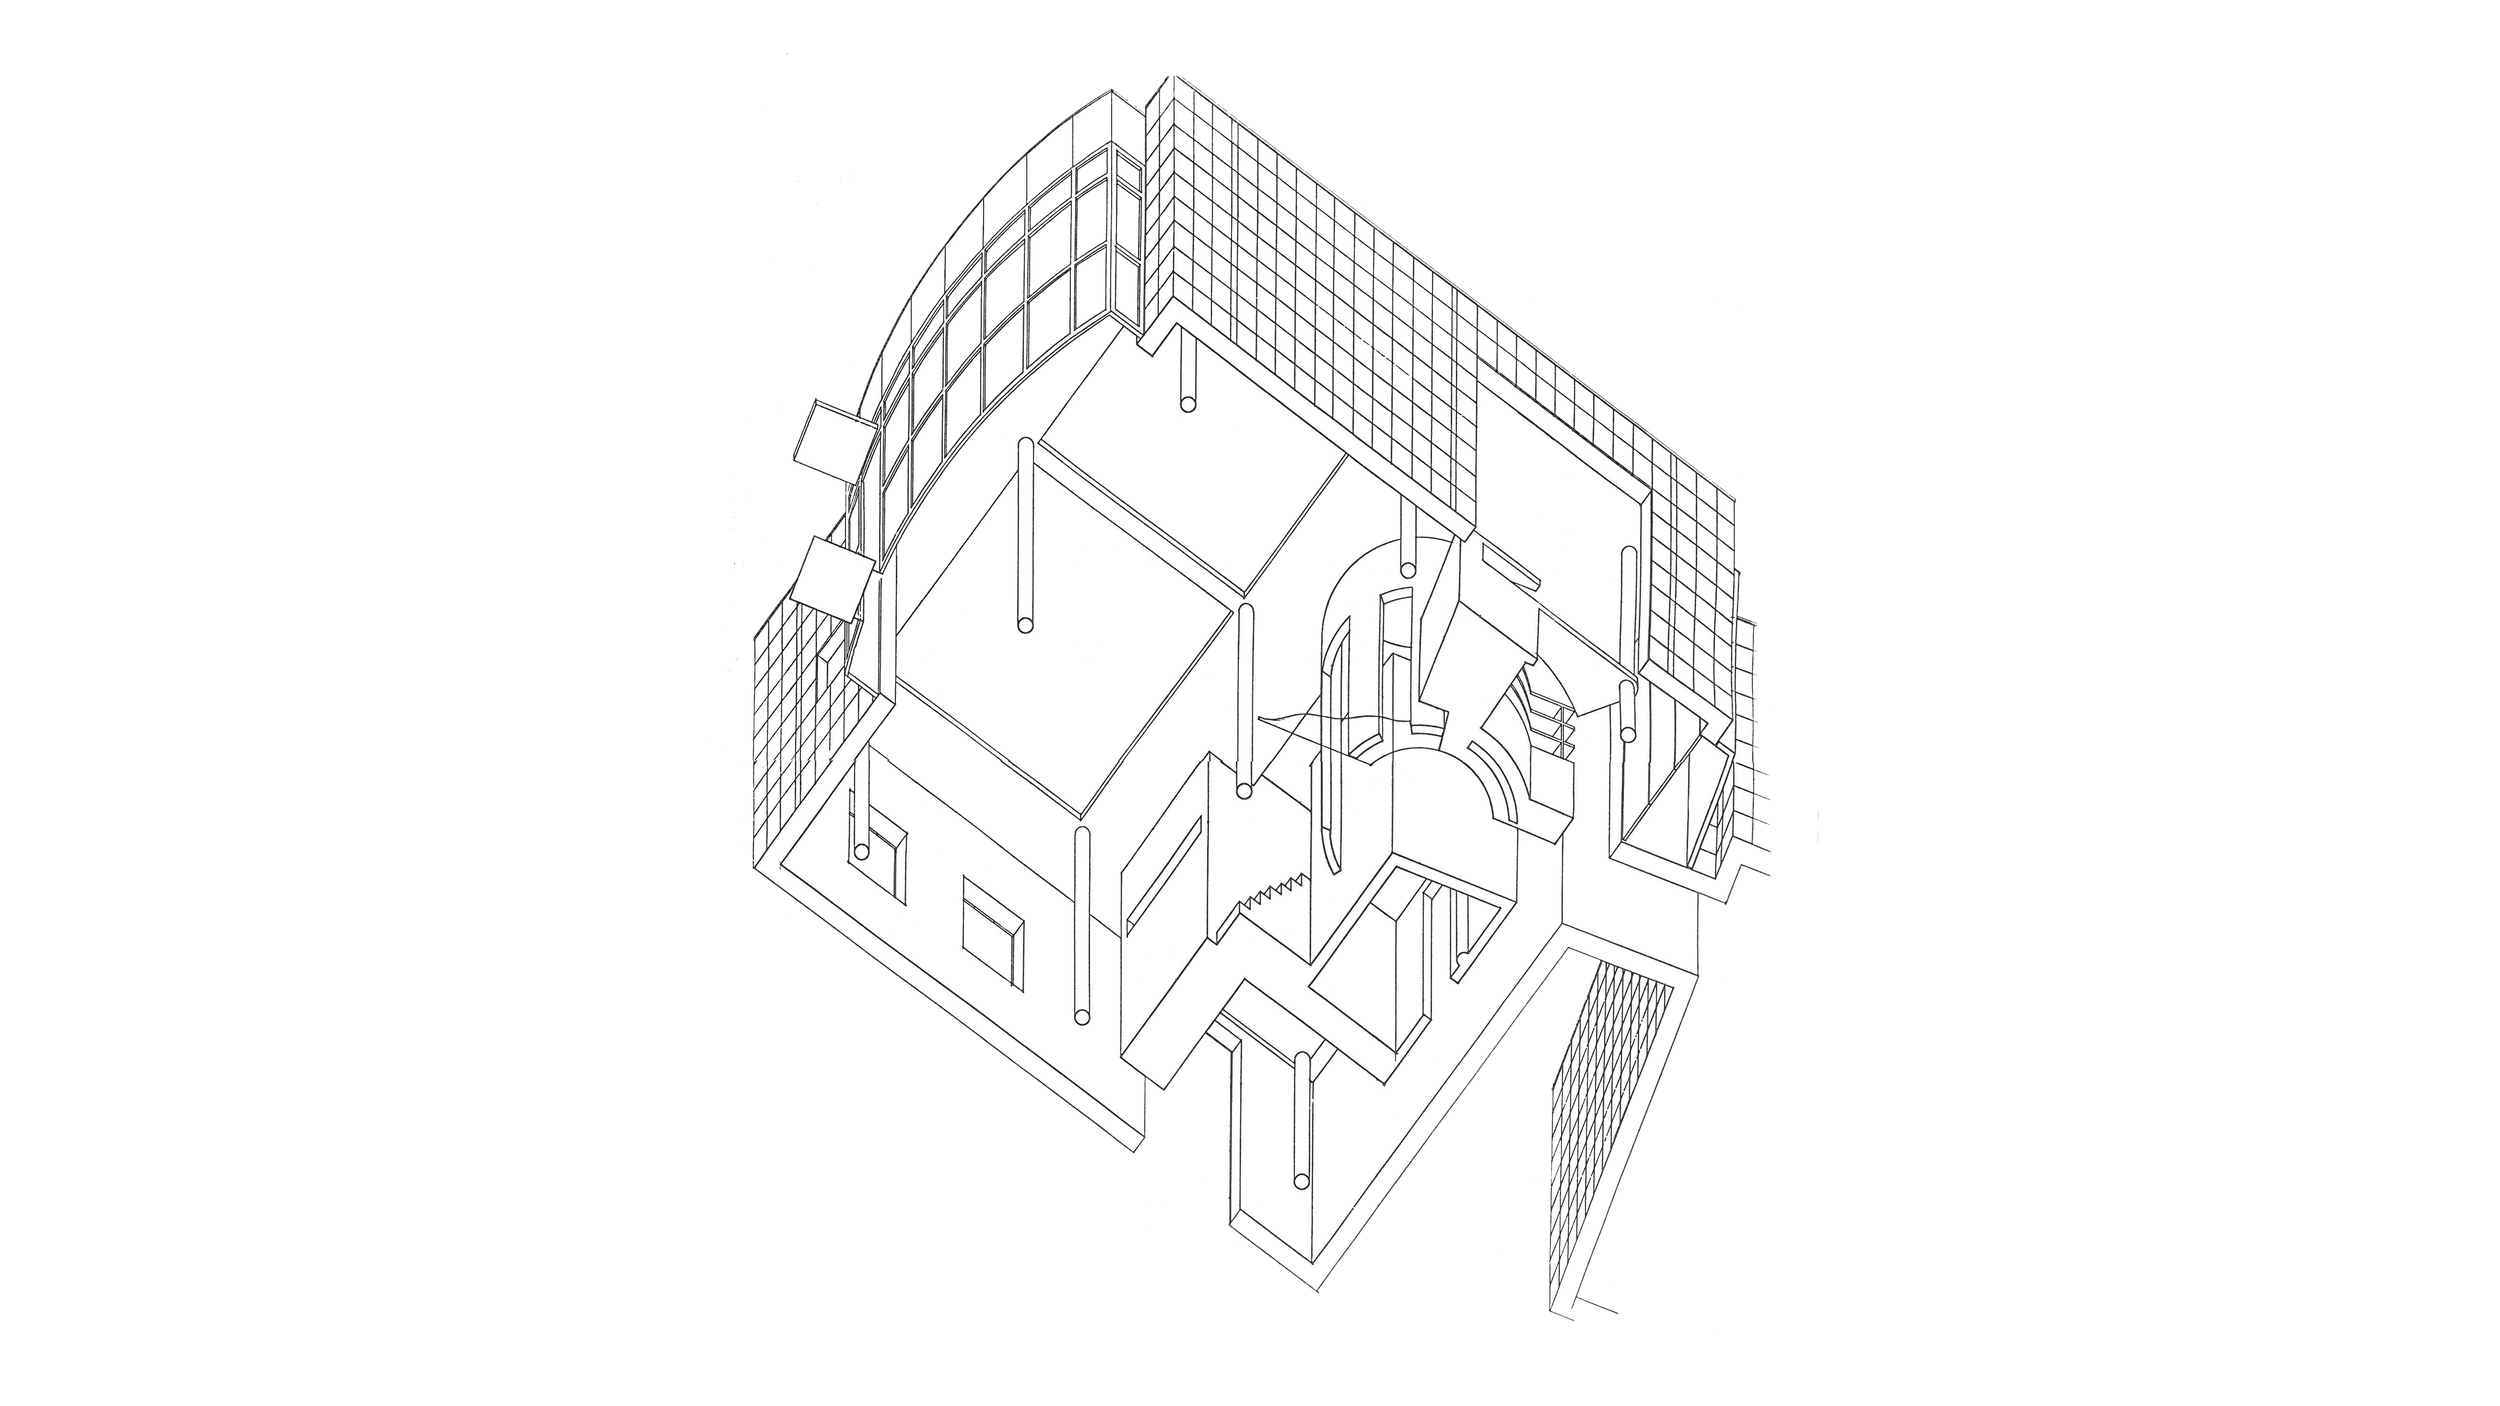 Woning R (c) architektenburo jef van oevelen-2.jpg